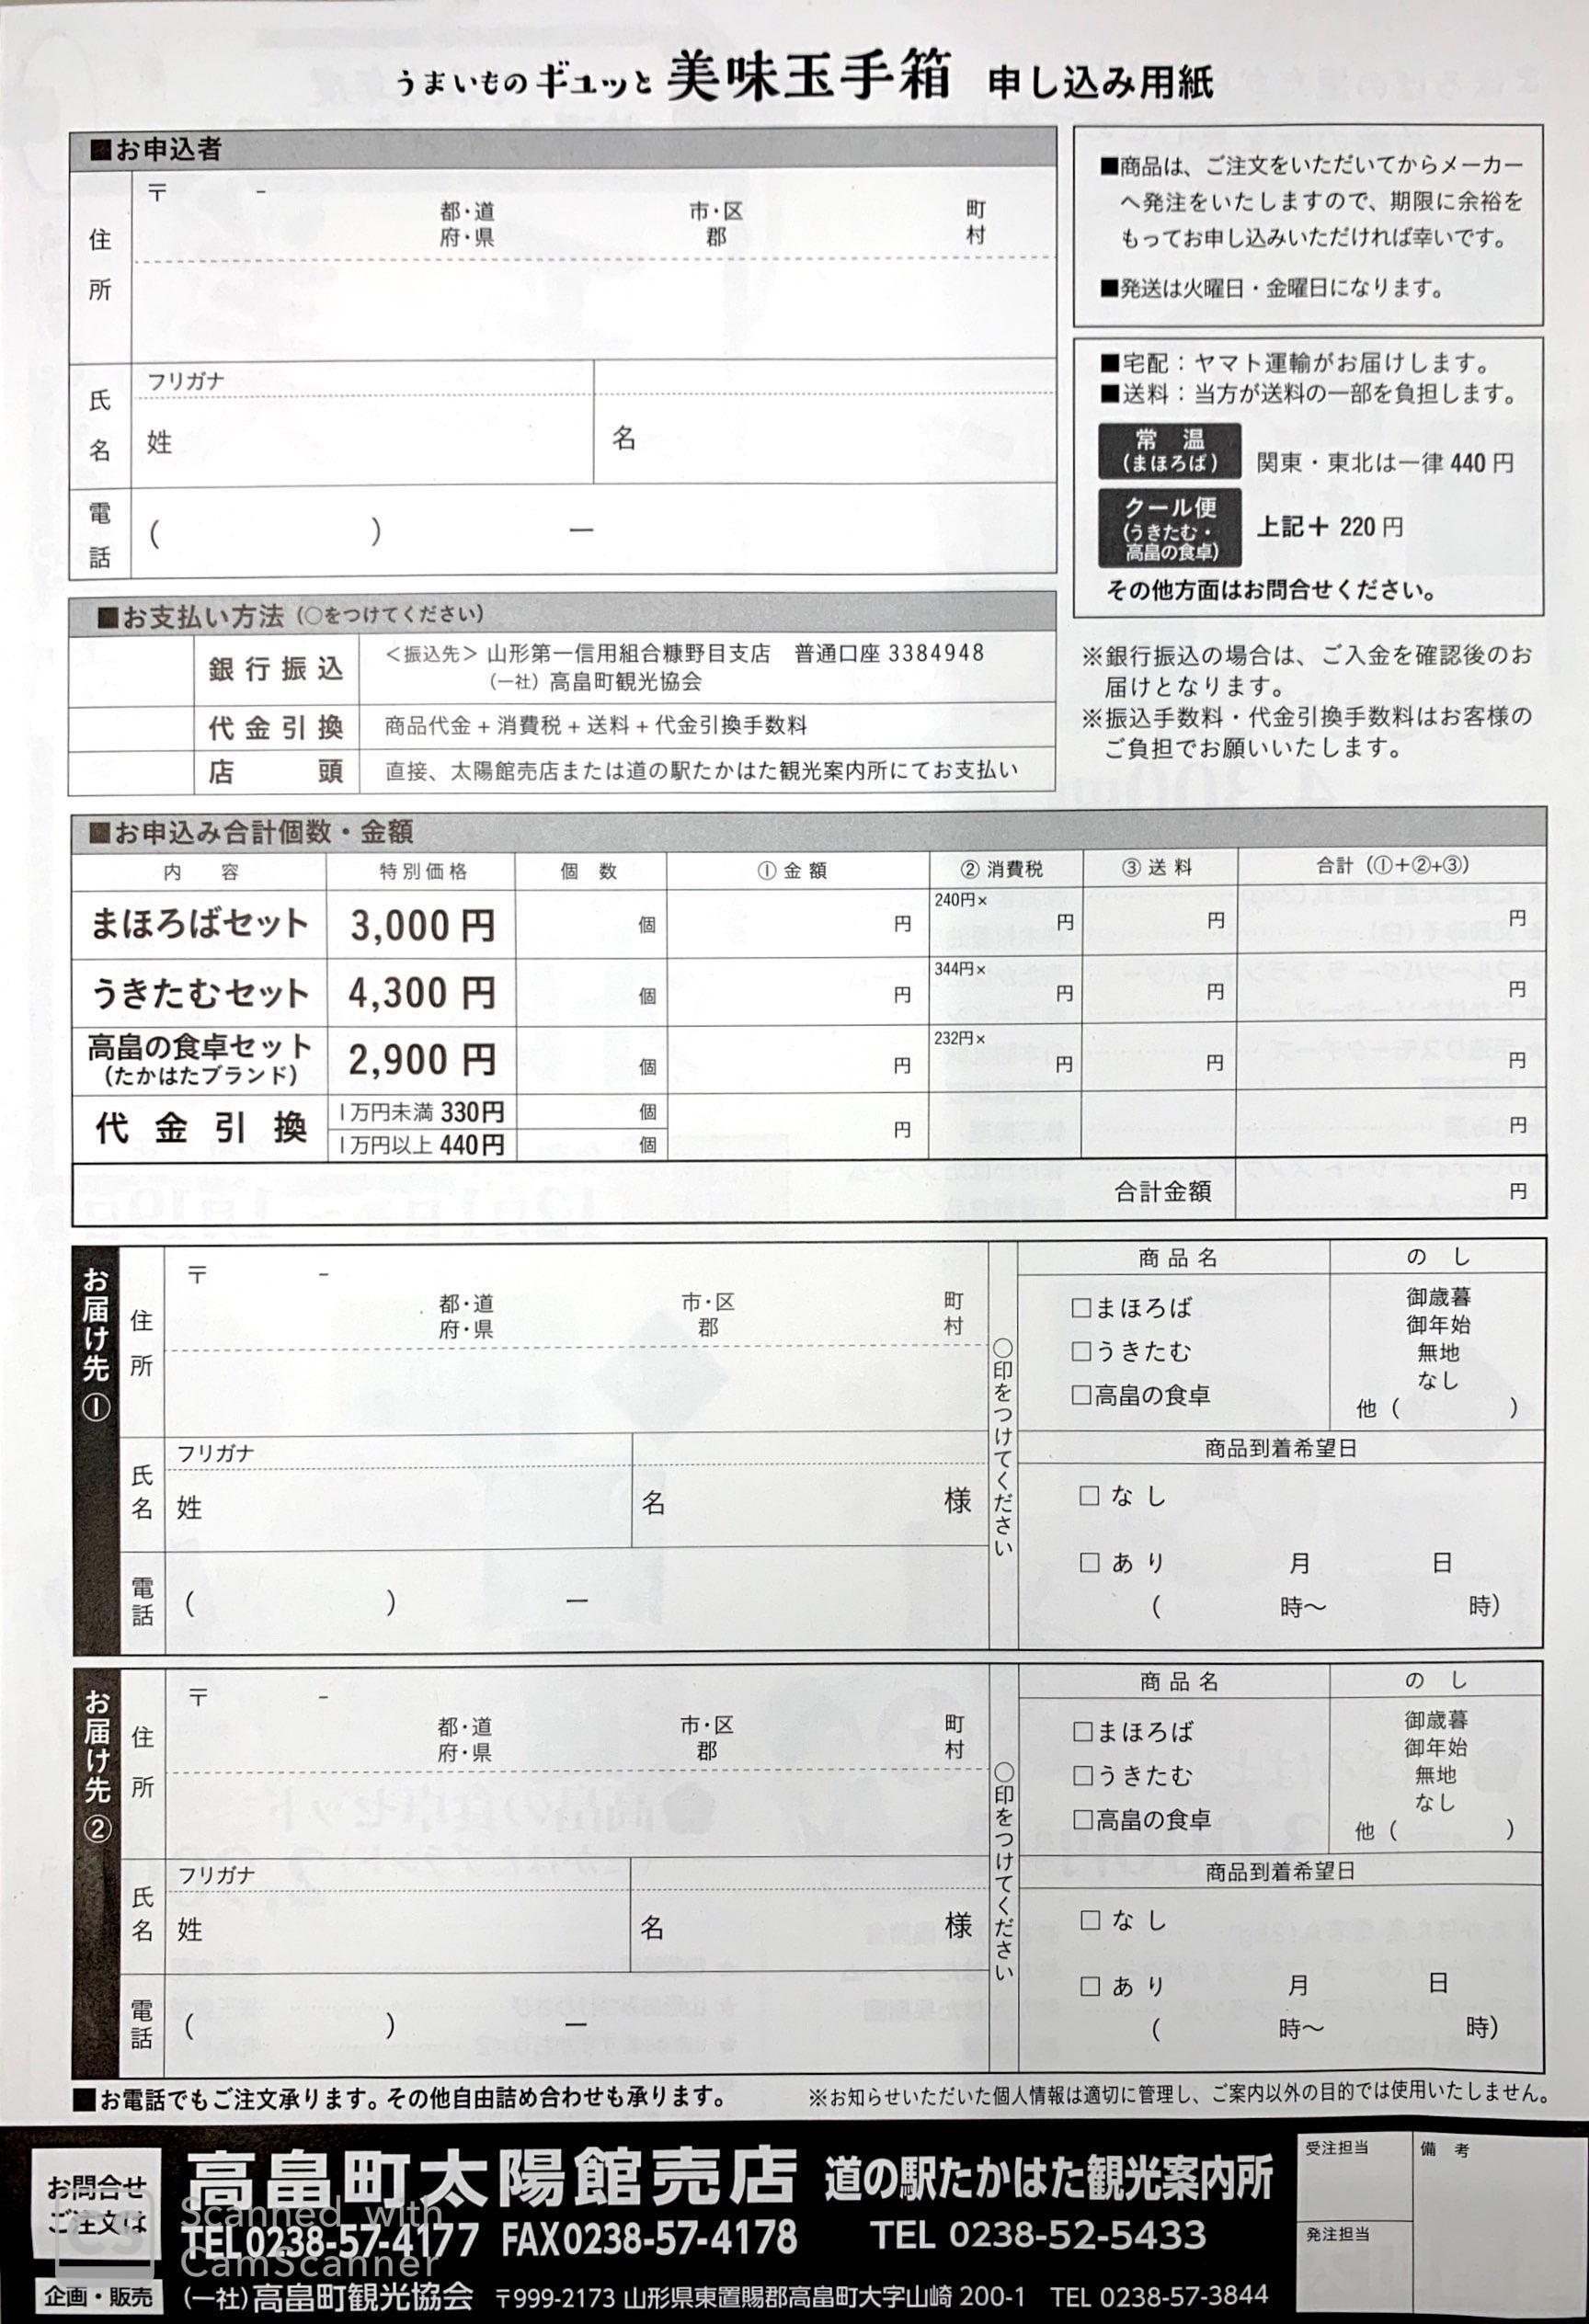 "2019 Takahata winter gift ""delicious Urashima's box"" beginning to sell!"